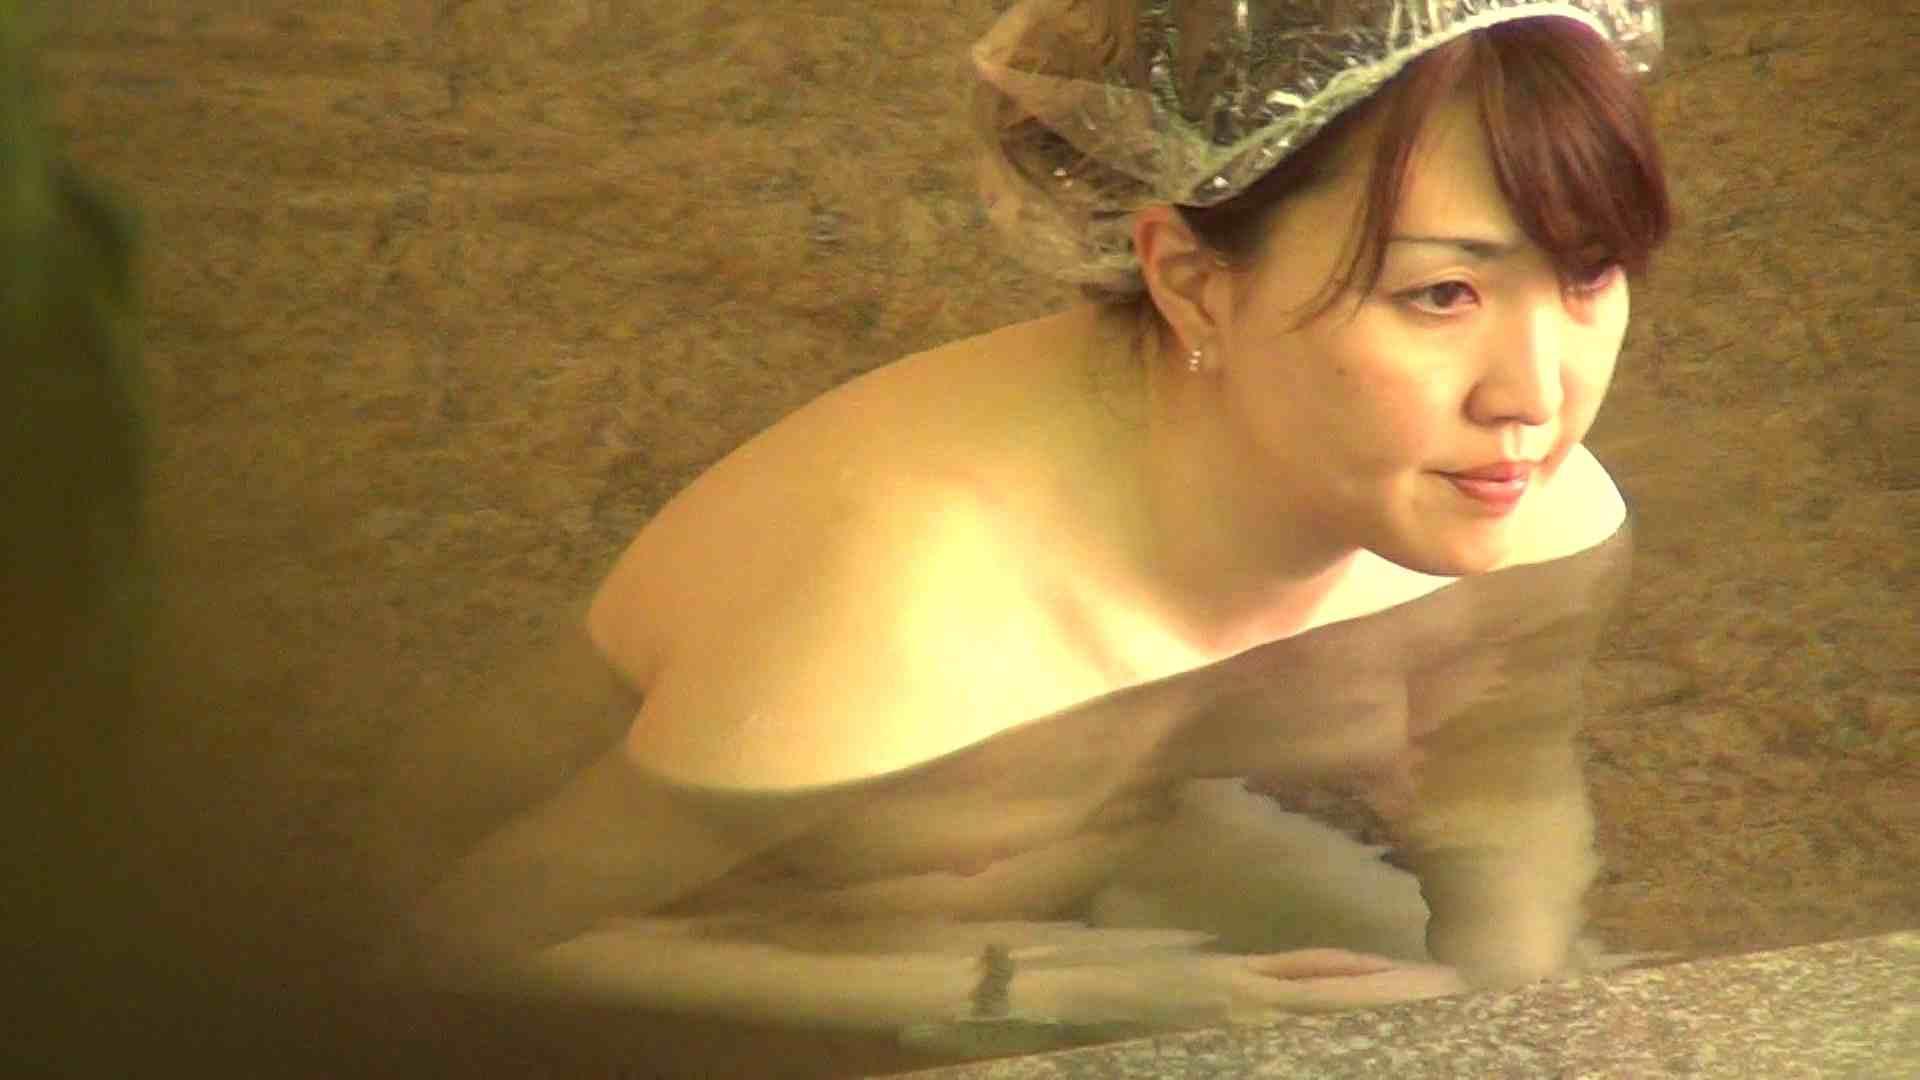 Aquaな露天風呂Vol.311 盗撮特撮  13pic 6